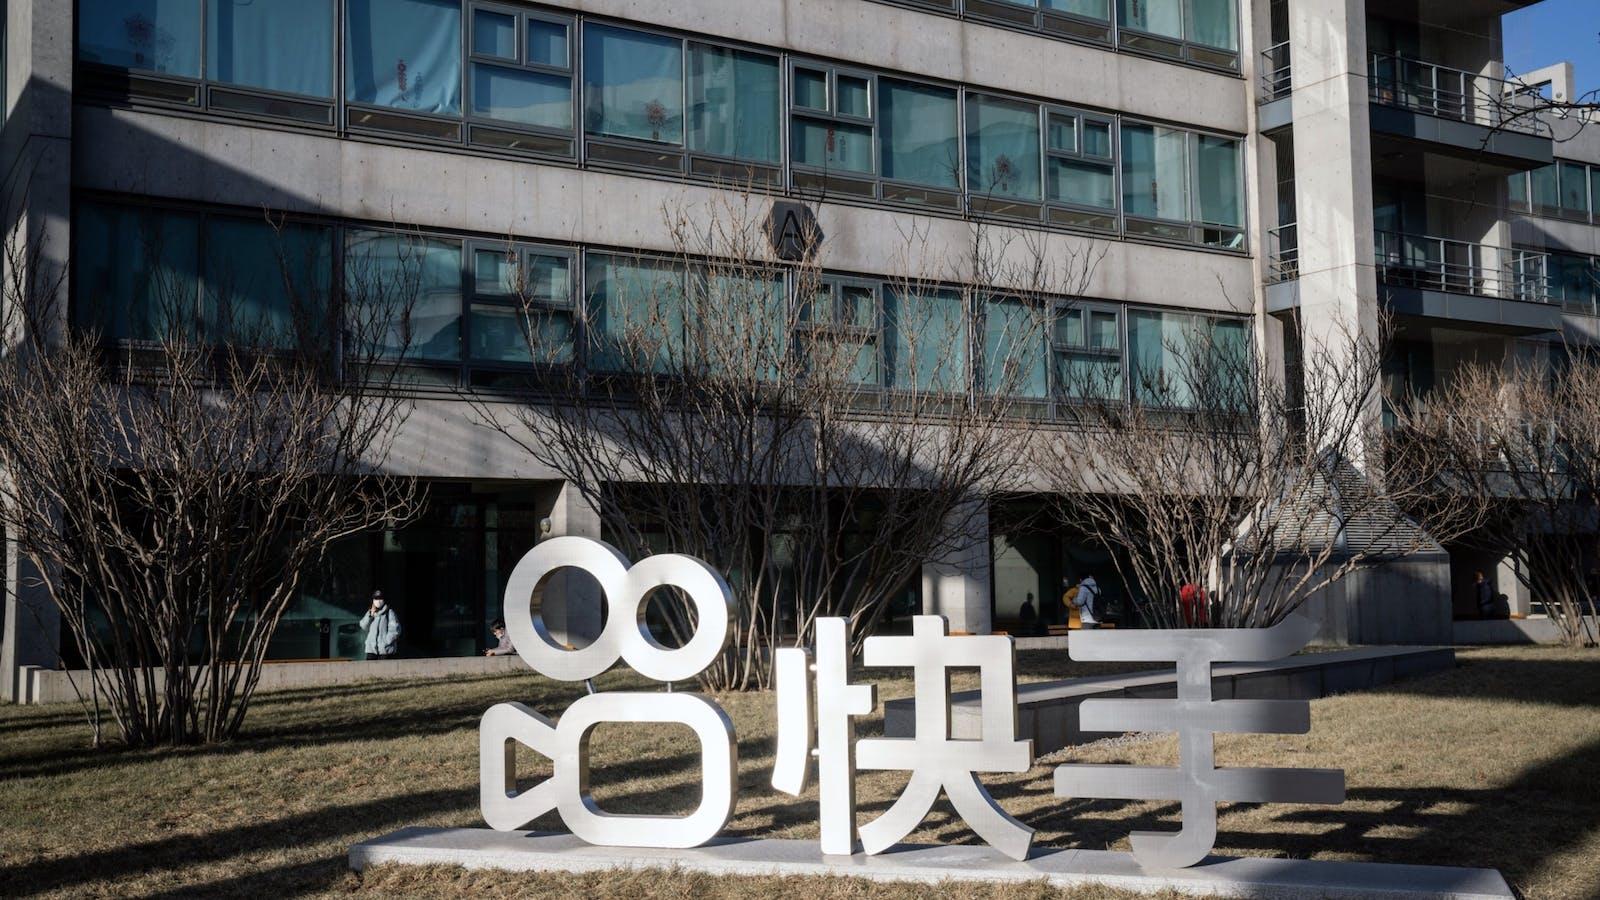 Kuaishou's headquarters in Beijing. Photo by Bloomberg